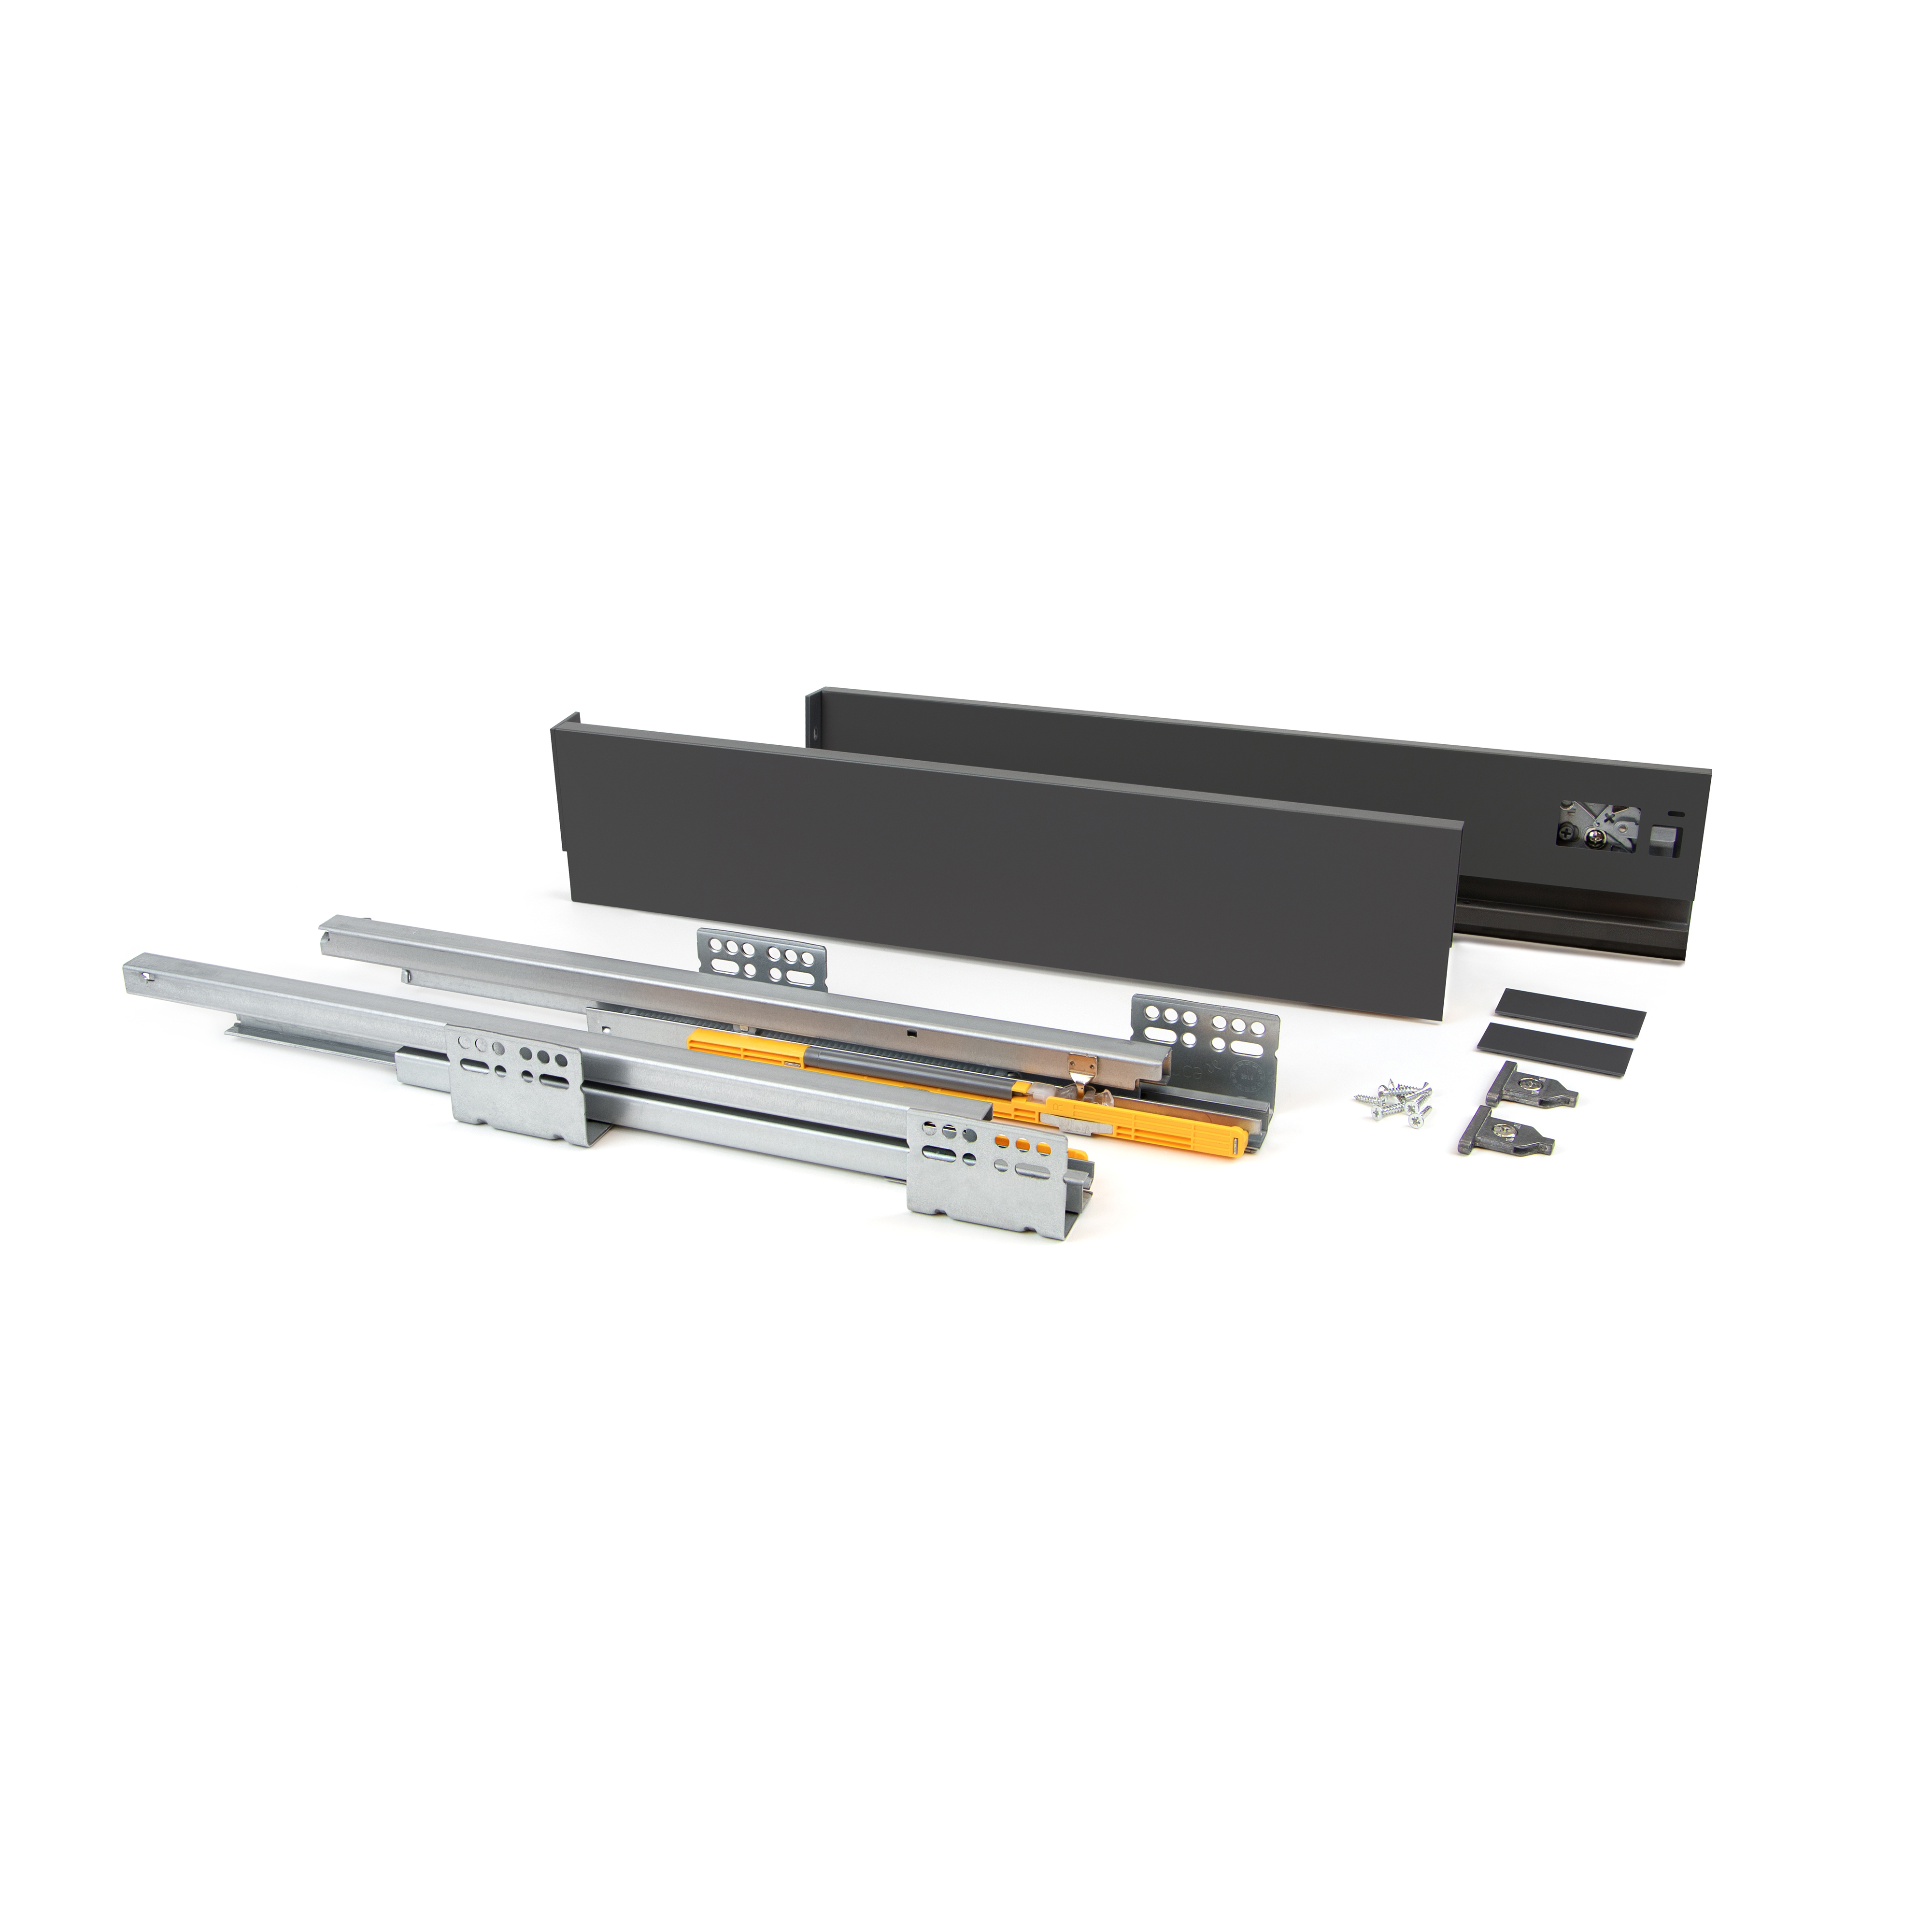 Emuca Kit cassetto per cucina Concept, altezza 105 mm, prof. 400 mm, chiusura soft, Acciaio, Grigio antracite